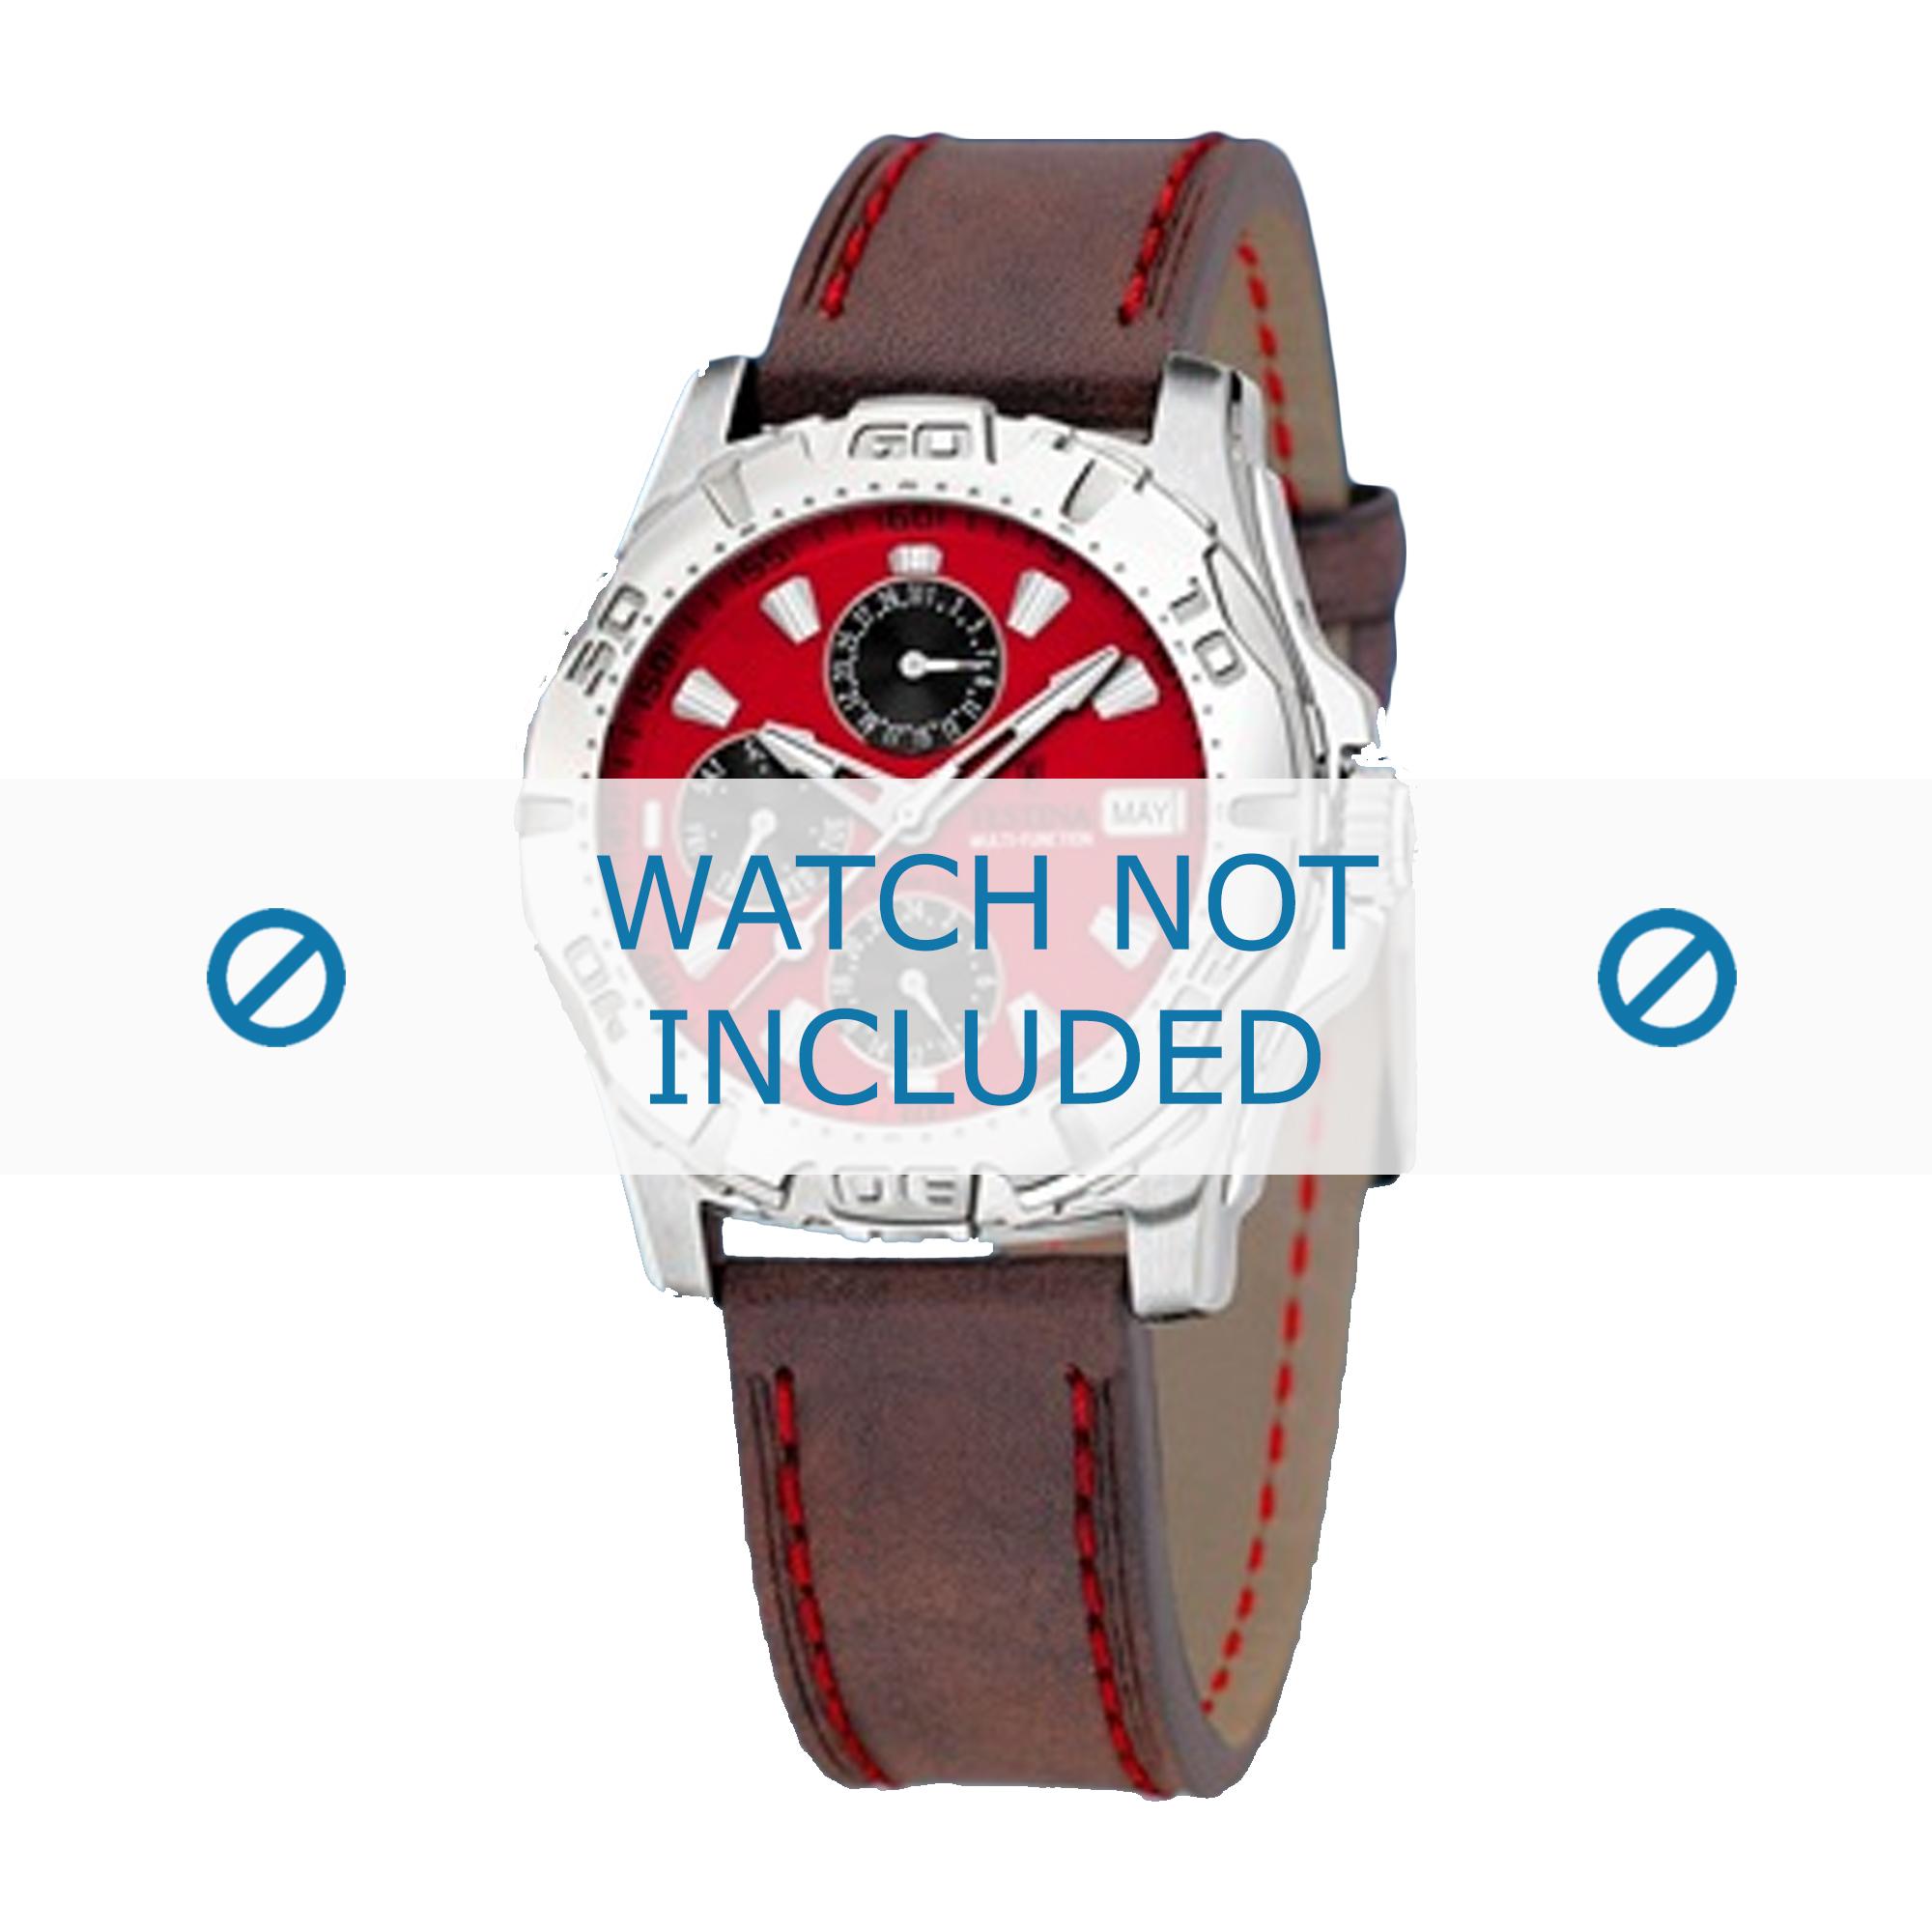 Festina horlogeband F16243/4 Leder Bruin 21mm + rood stiksel